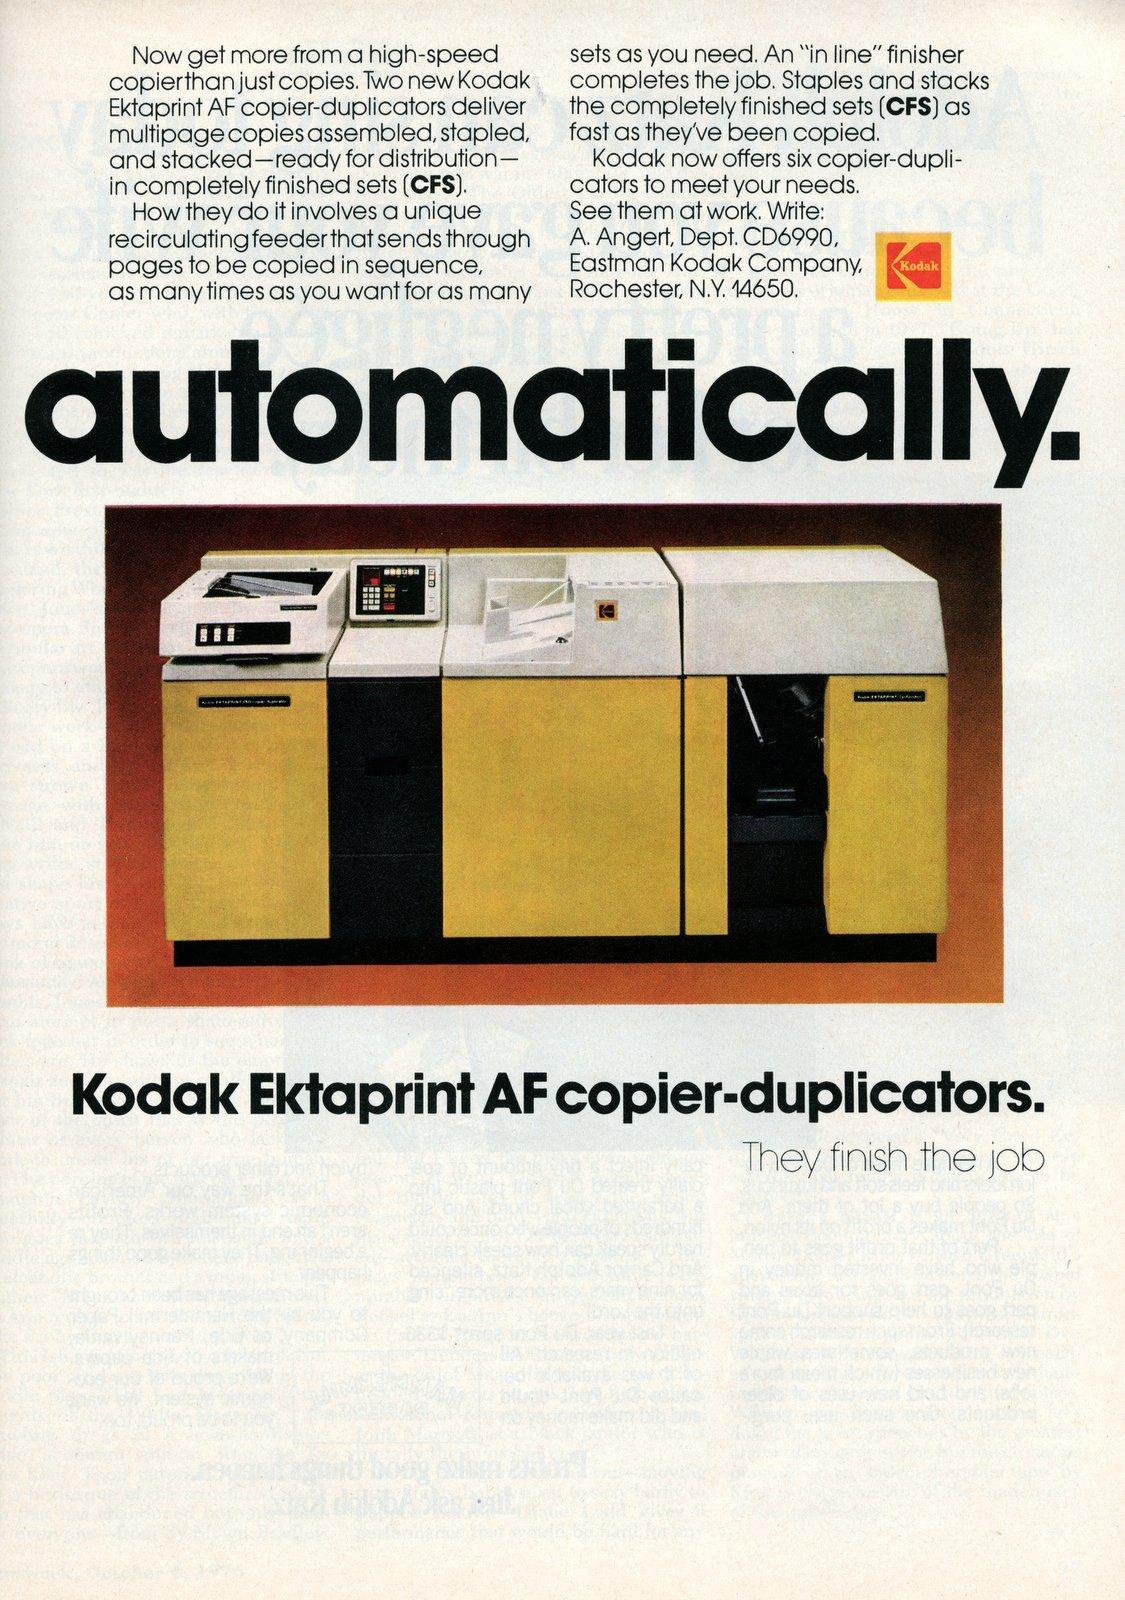 Vintage yellow Kodak Ektaprint AF copier-duplicators (1976)